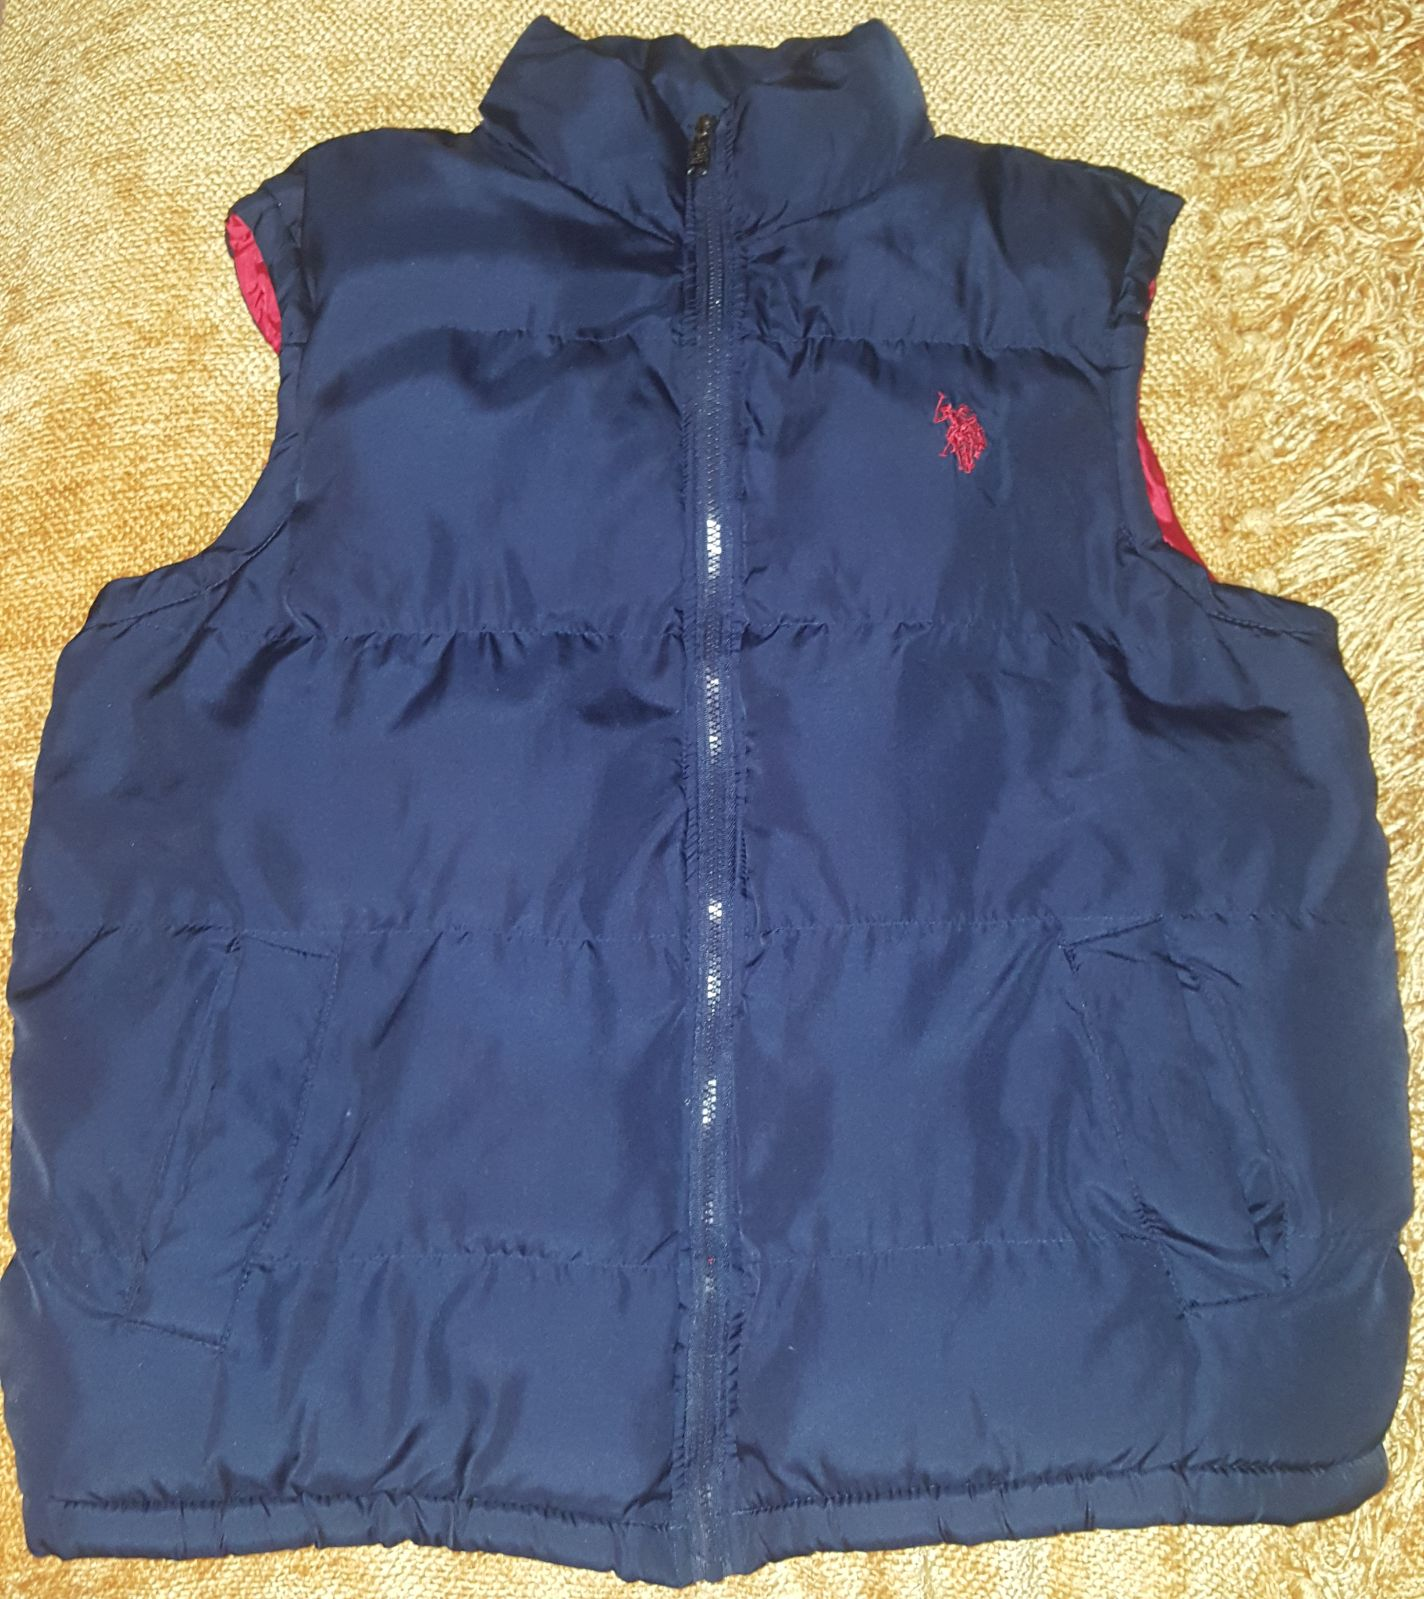 U.S. Polo Assn. Puffy Vest